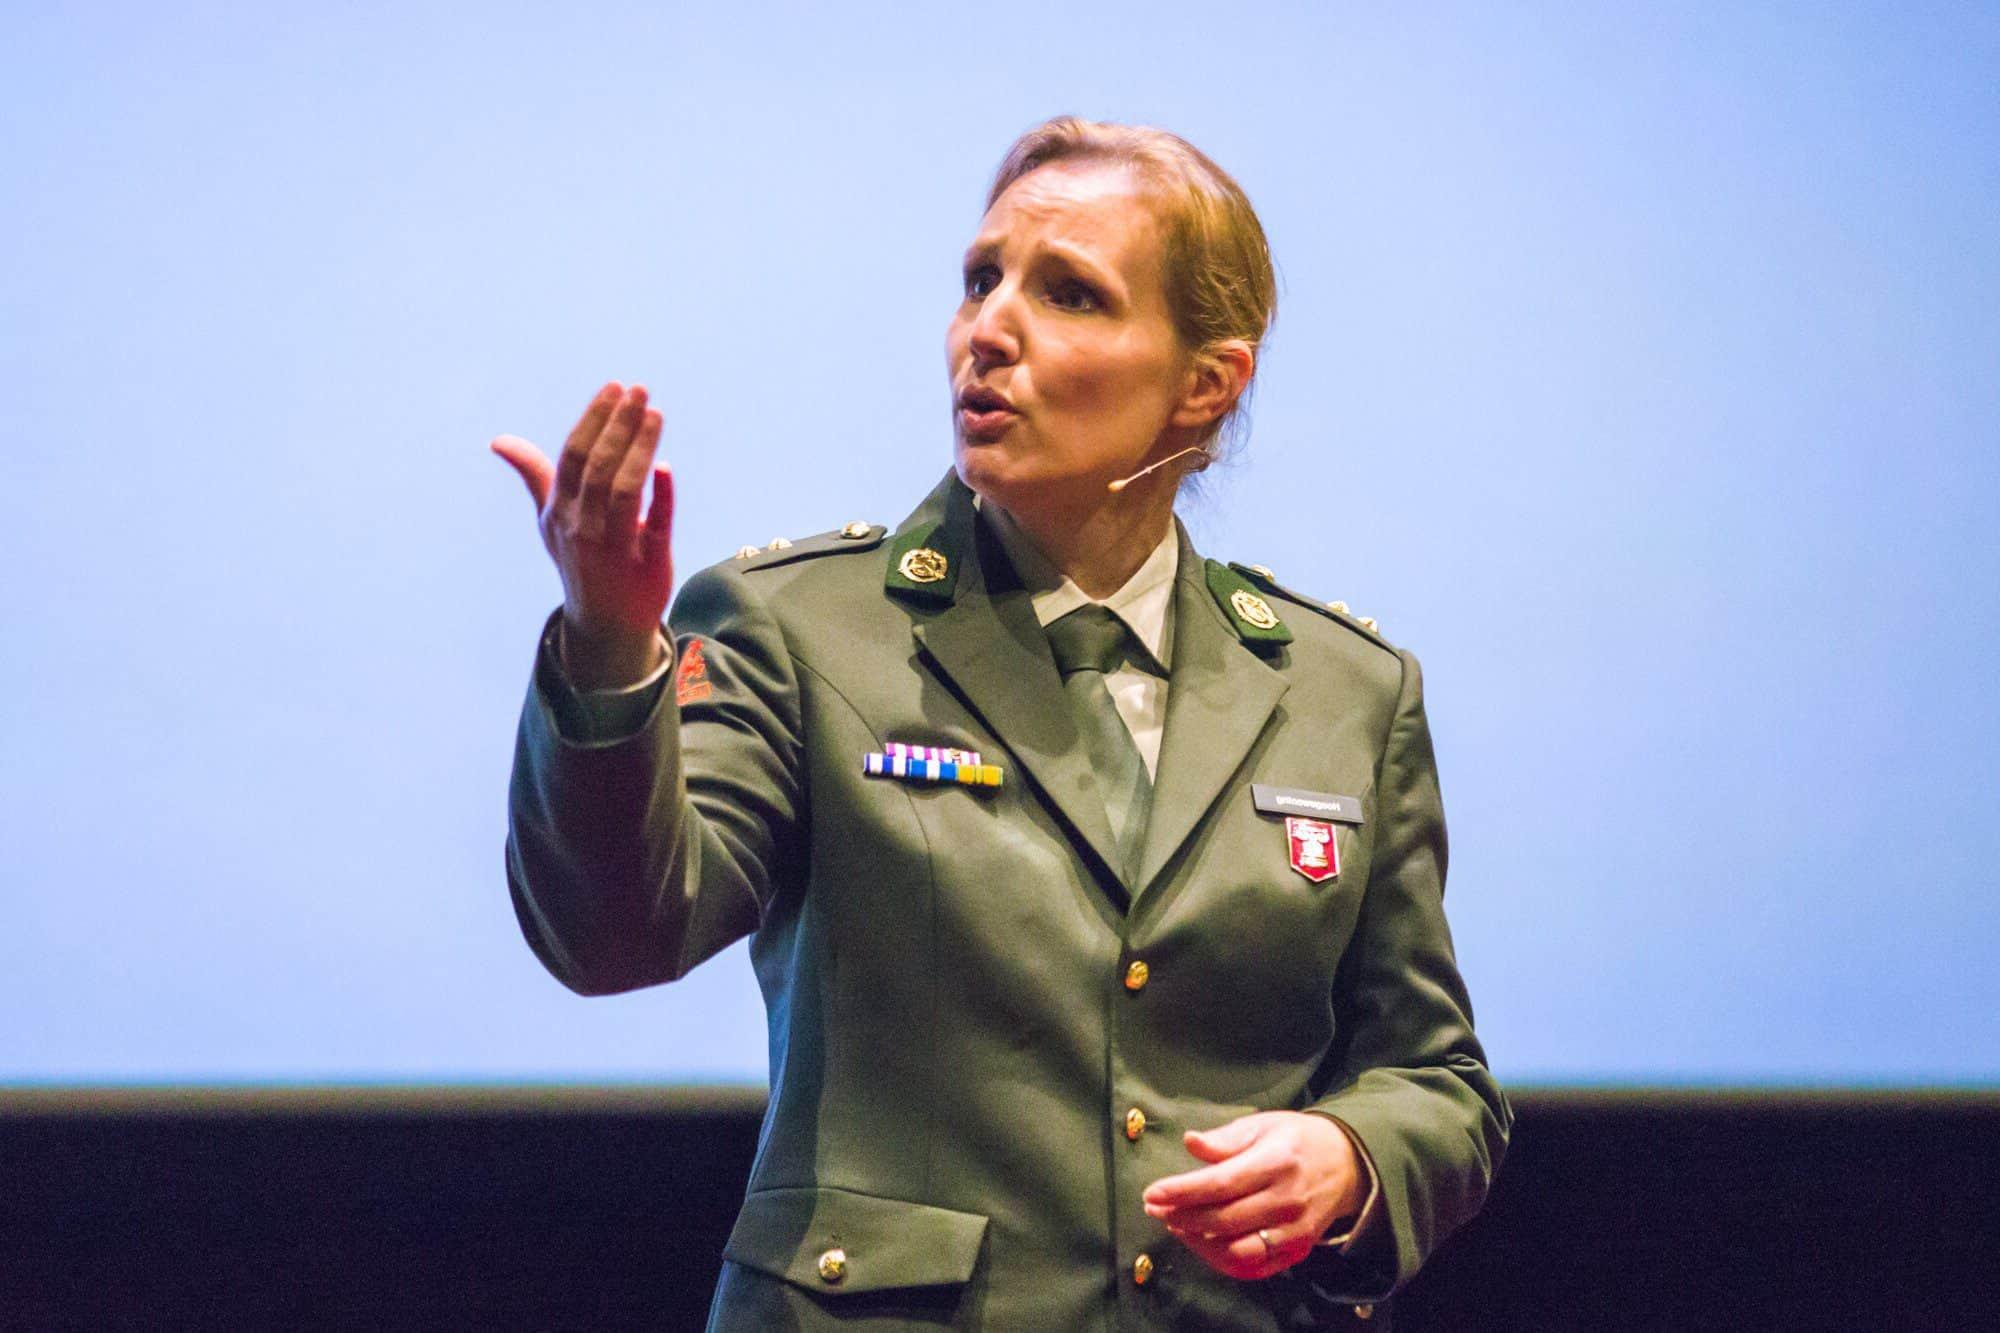 TED Talk Gouda Maaike Hoogewoning